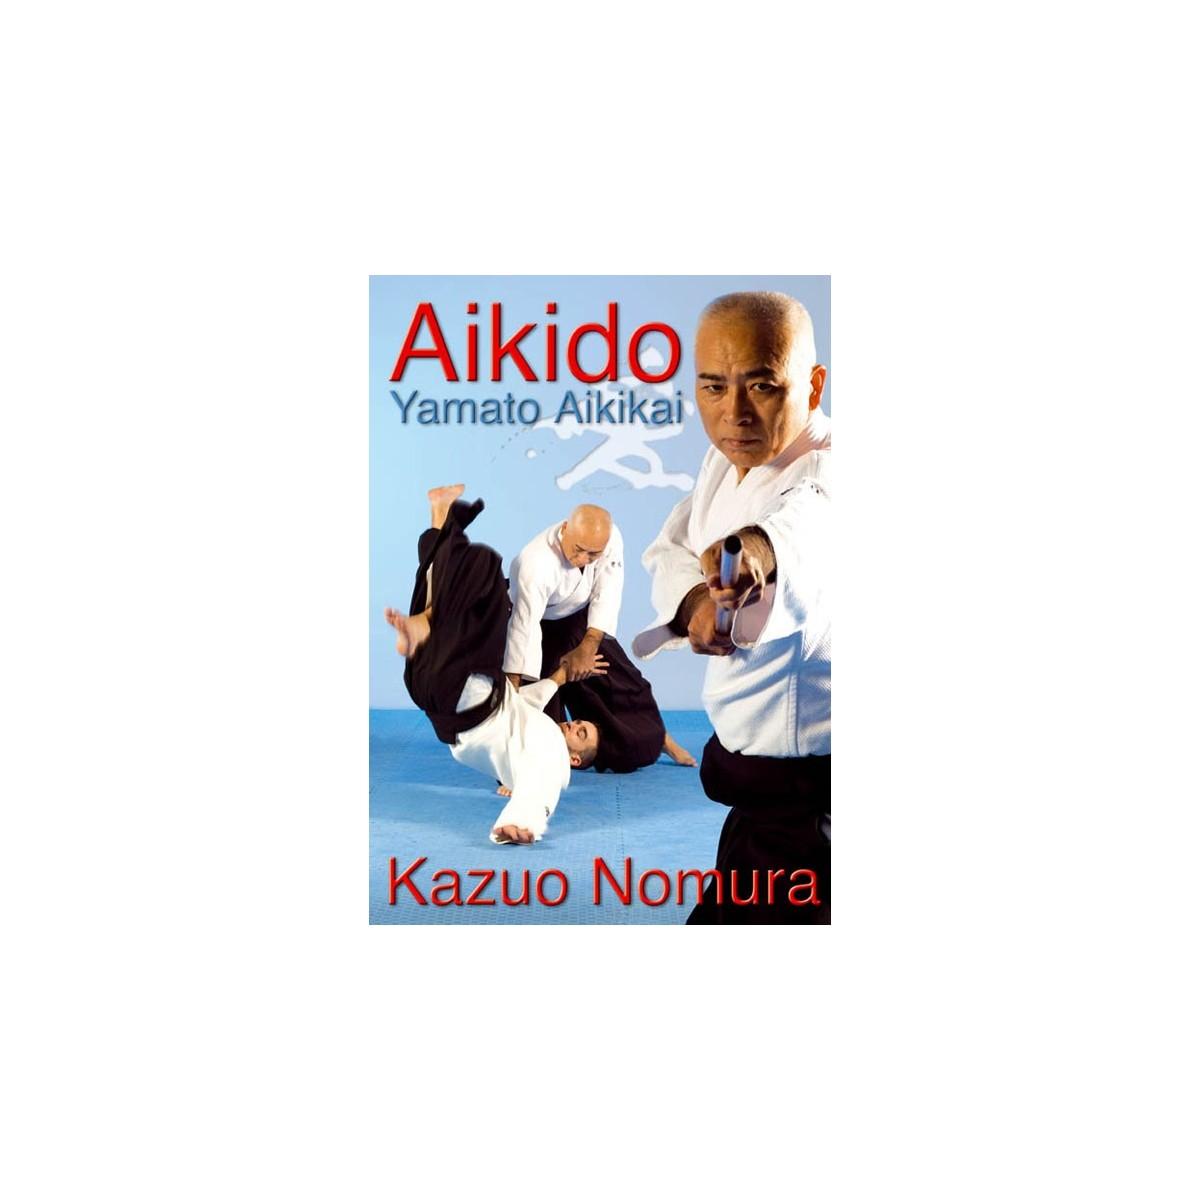 libro aikido yamato aikikai Aikido Classes Steven Seagal Aikido Master